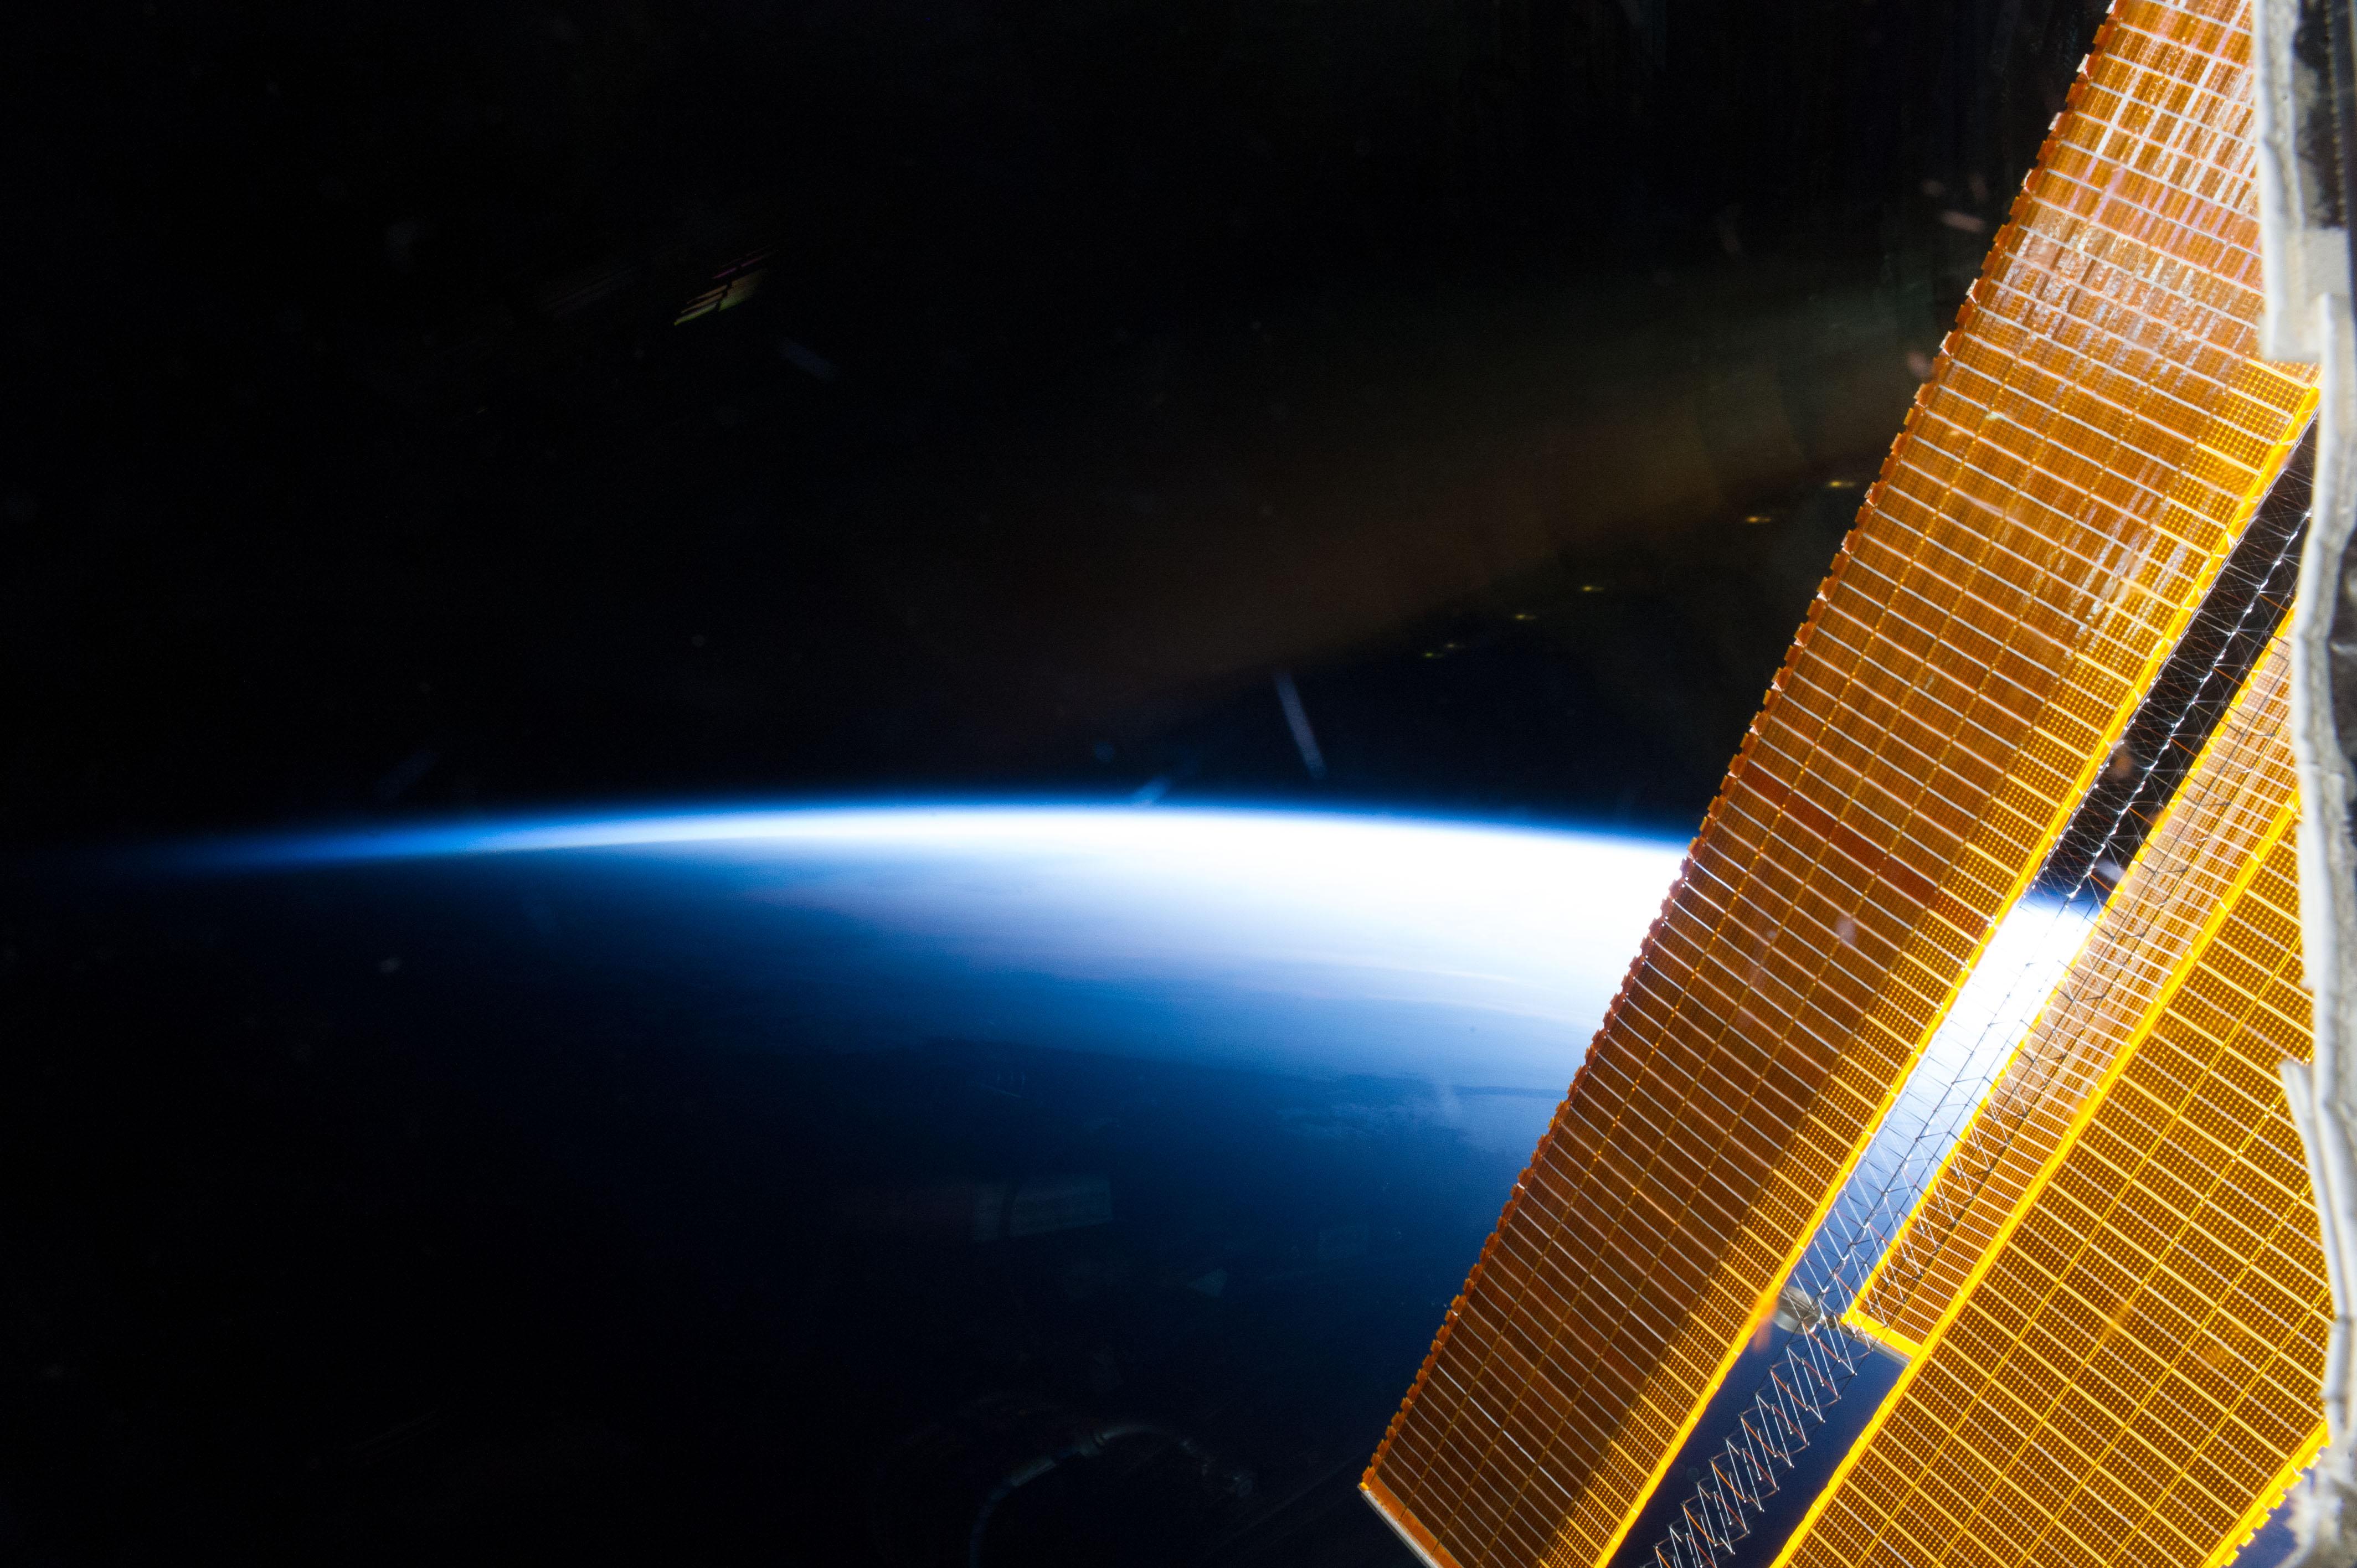 spacecraft solar array panels - photo #25